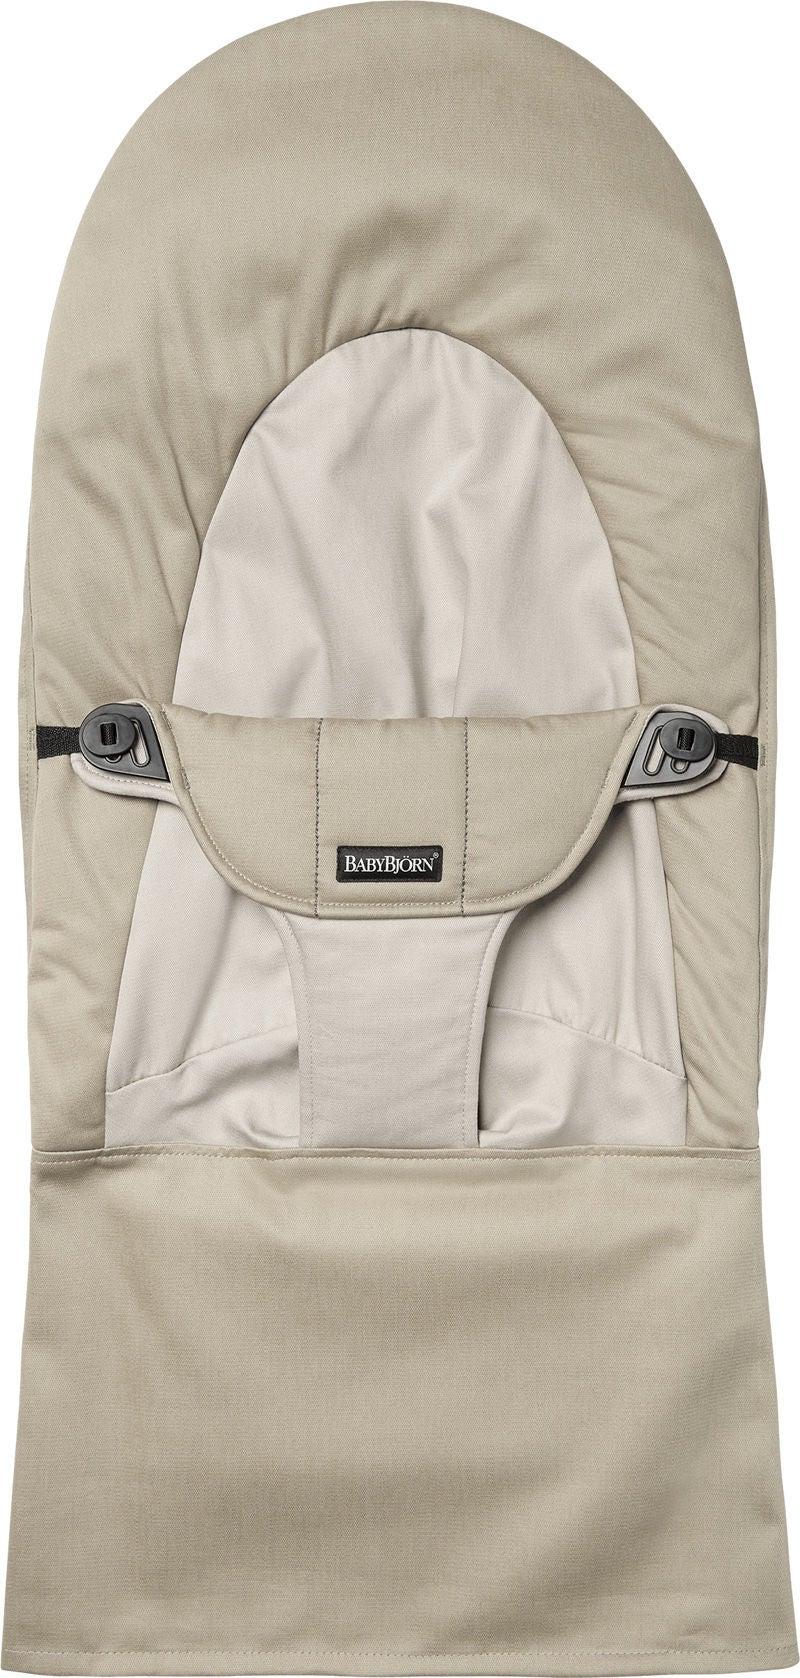 BabyBjörn Balance Soft Tygsits, Khaki/Beige